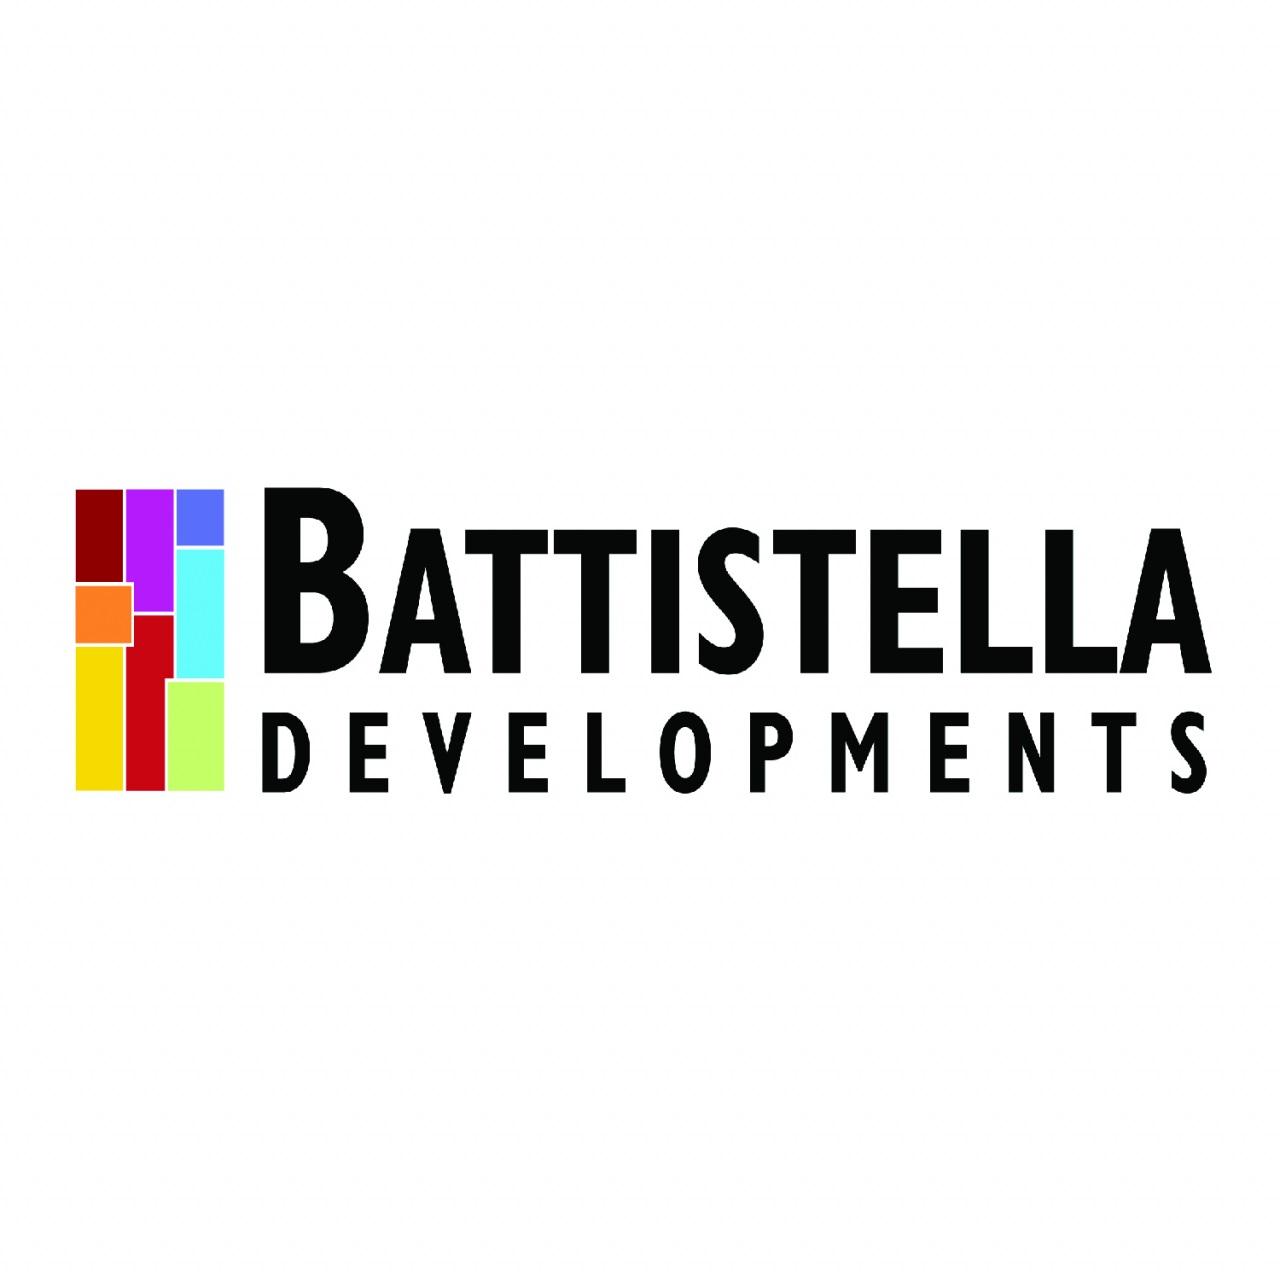 battistella-developments